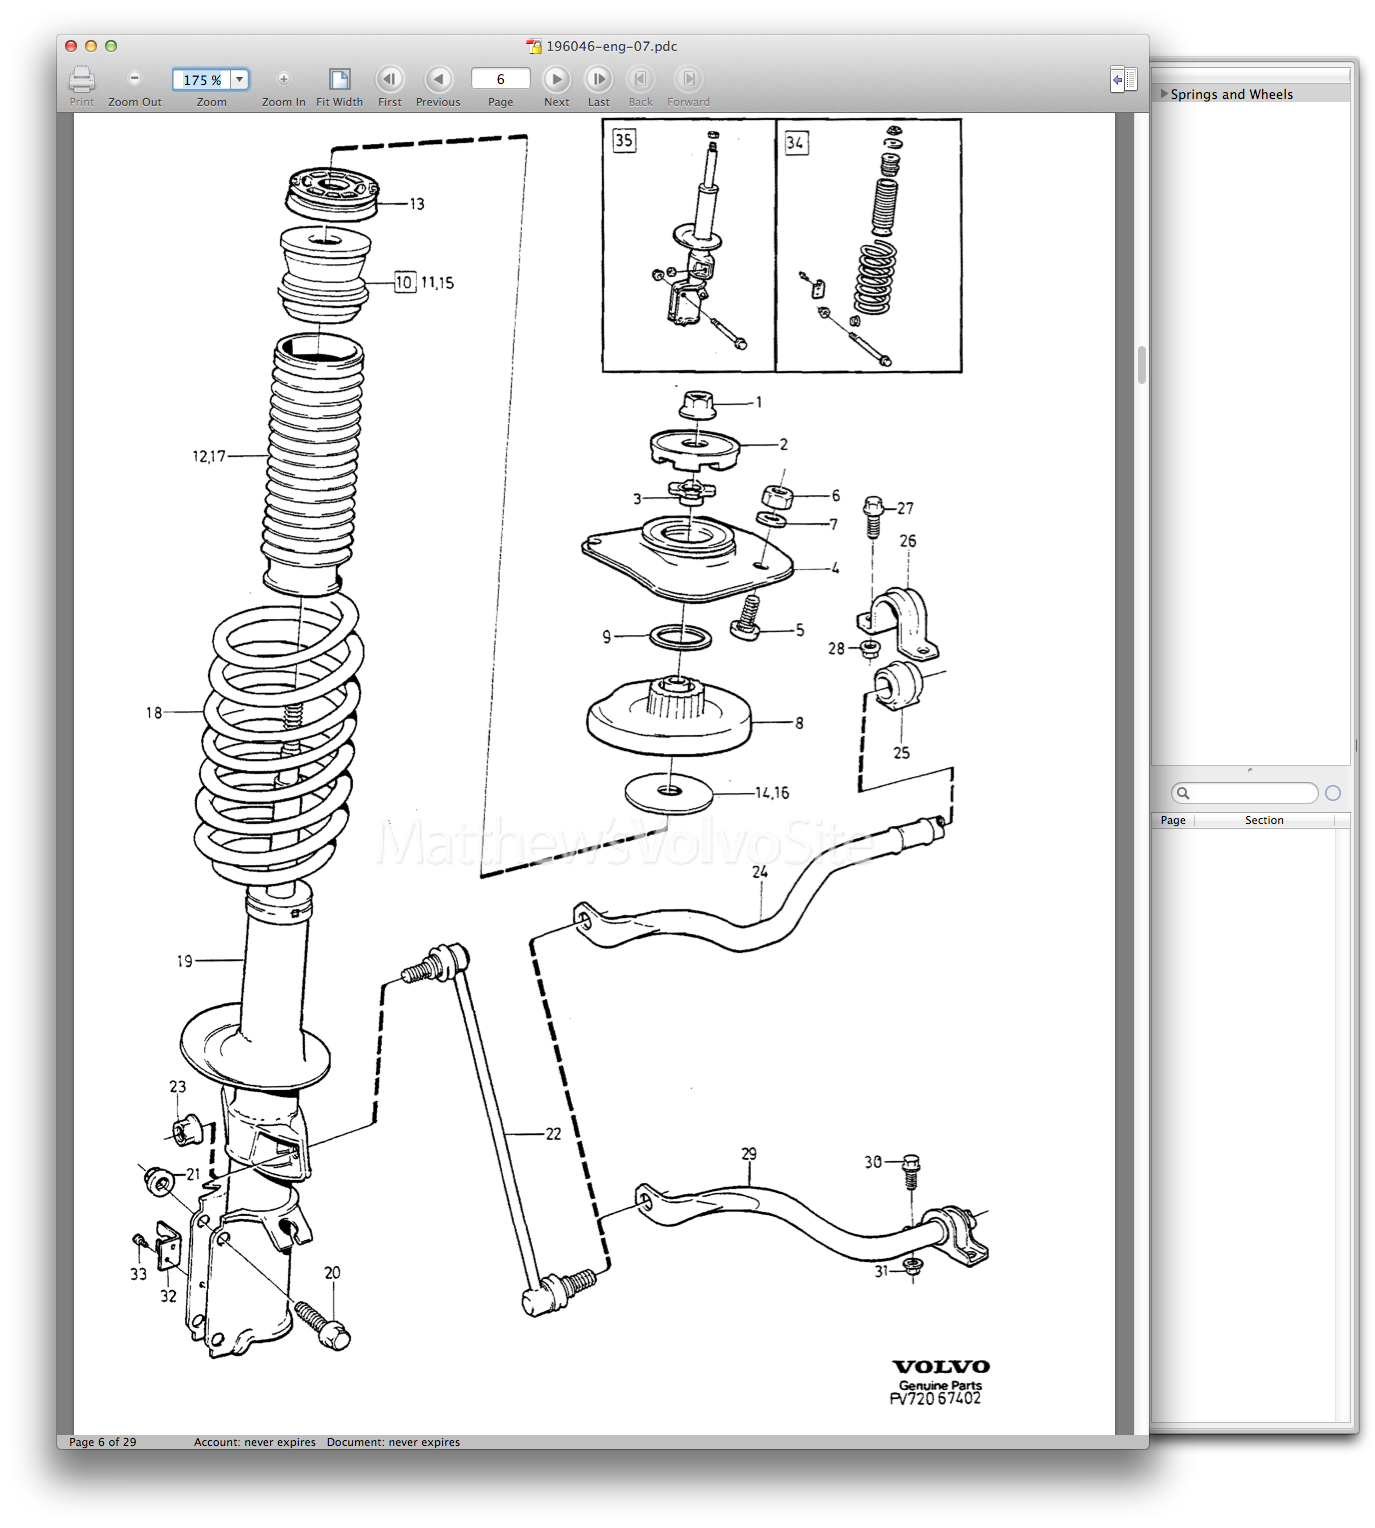 original technical publications 850 dvd nissan primera electronic service manual nissan primera repair manual pdf